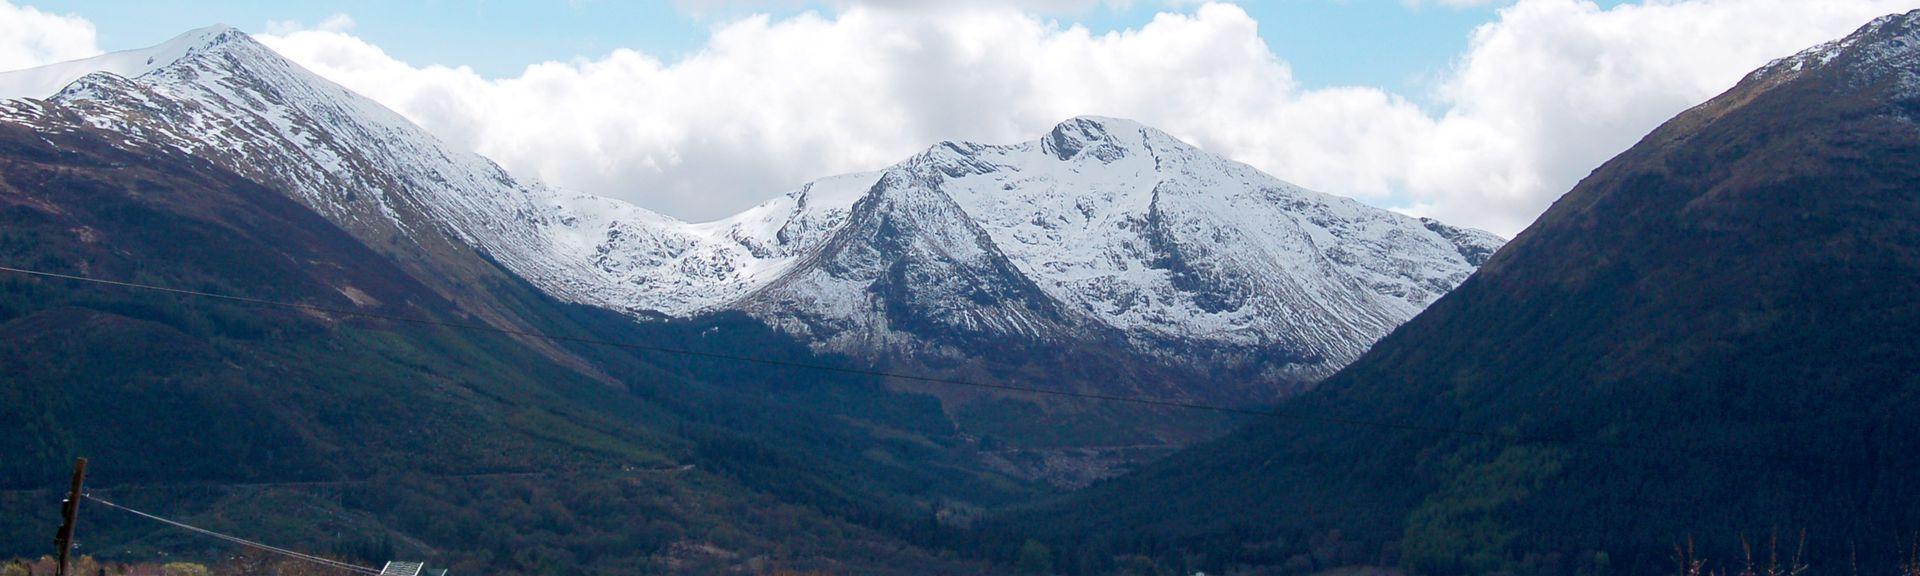 Ballachulish, Schotland, Verenigd Koninkrijk